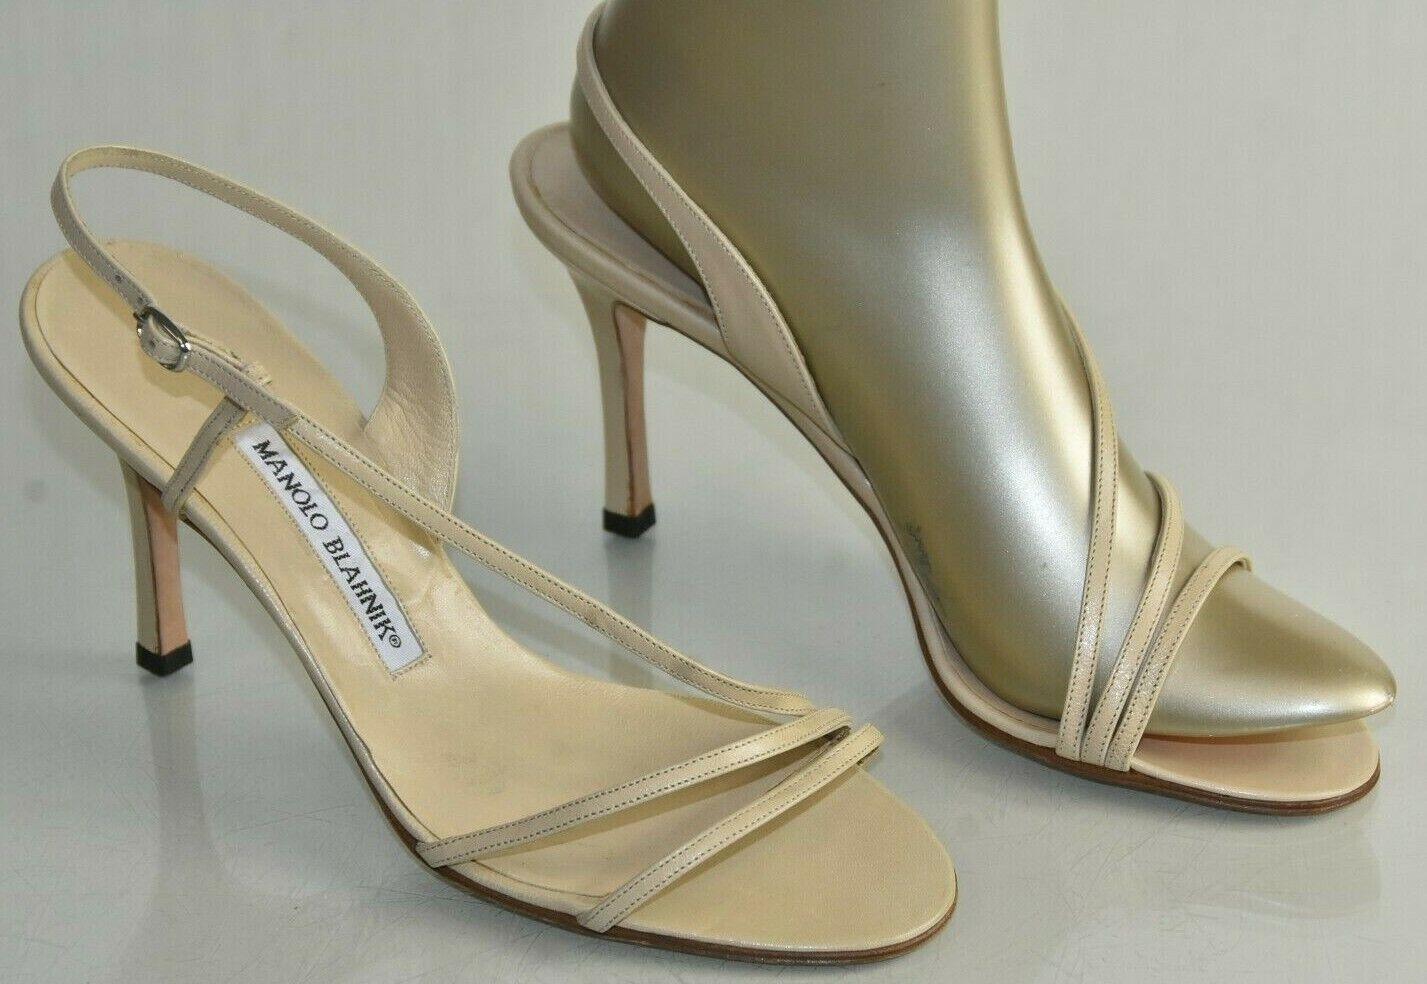 865 NEW Manolo Blahnik TUNICA Strappy NUDE Leather Sandal Beige Heel Shoes 385